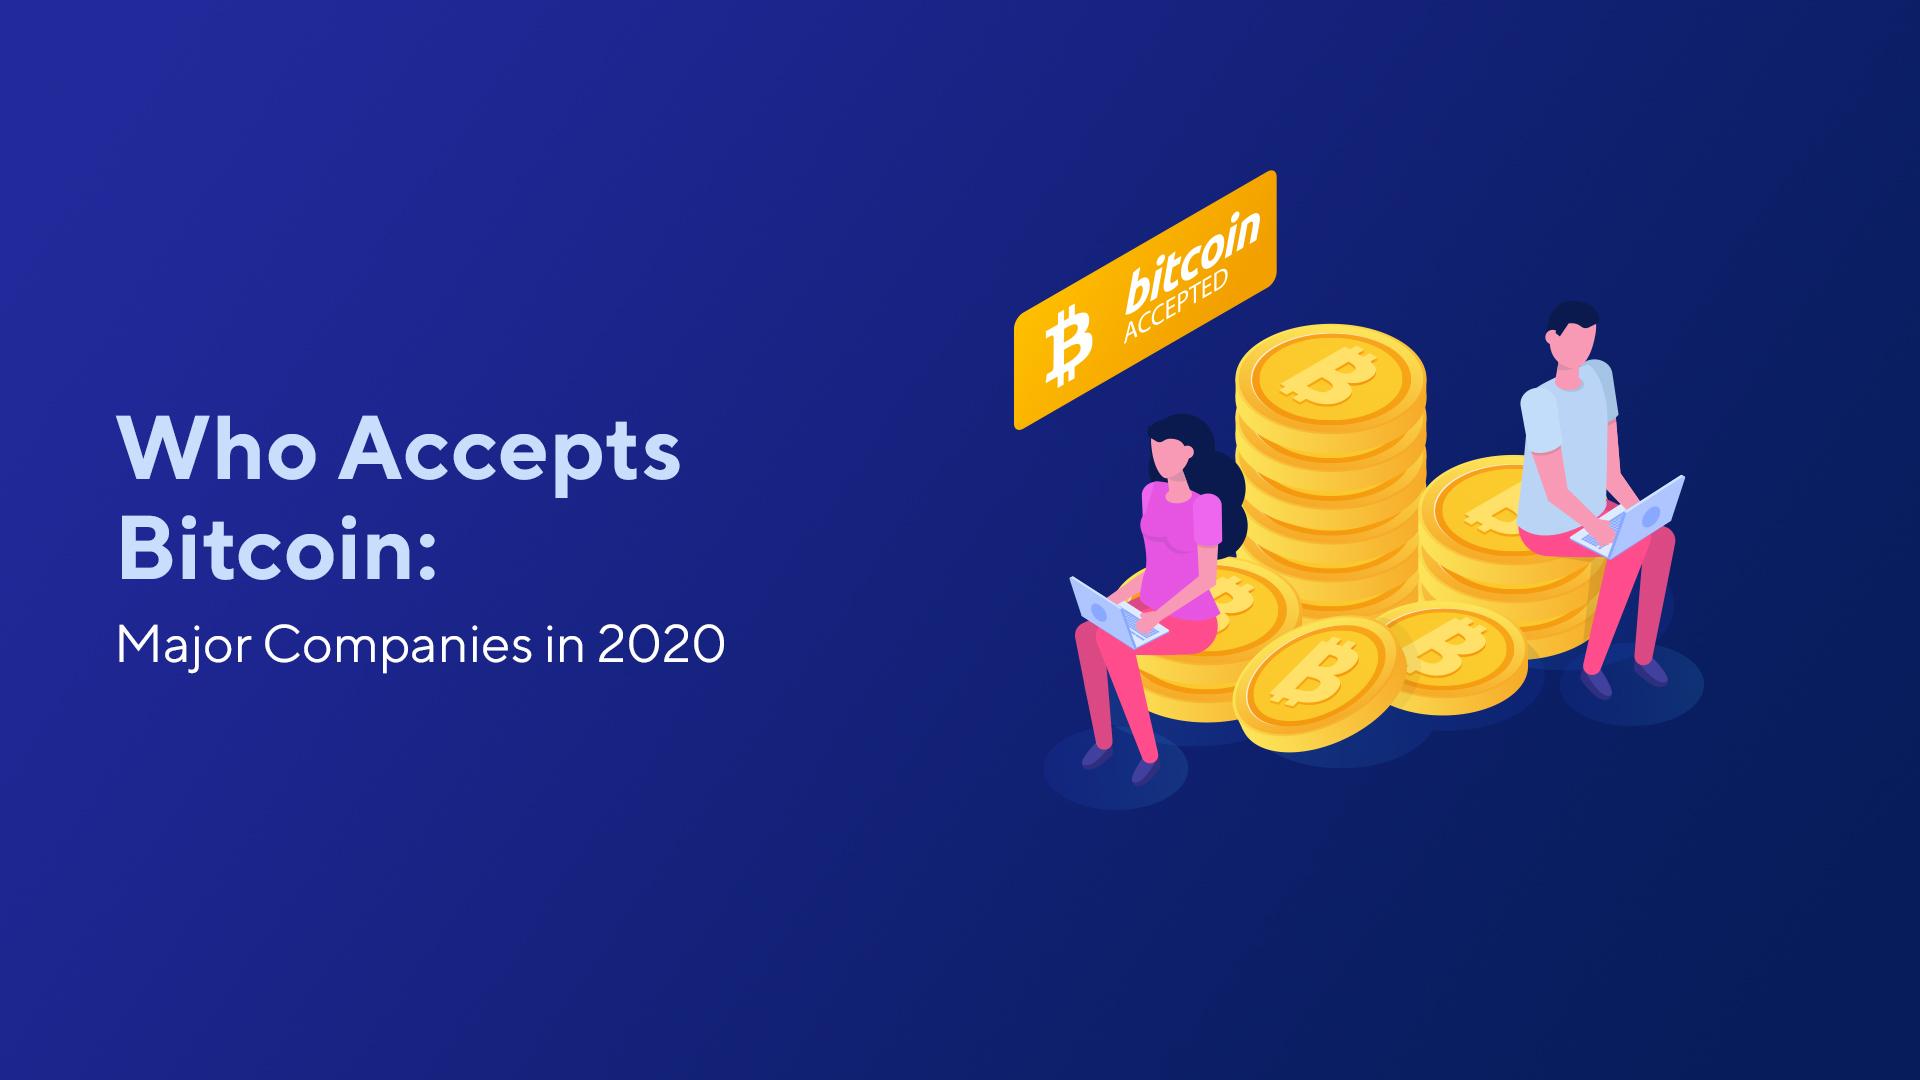 Who Accepts Bitcoin: Major Companies in 2020